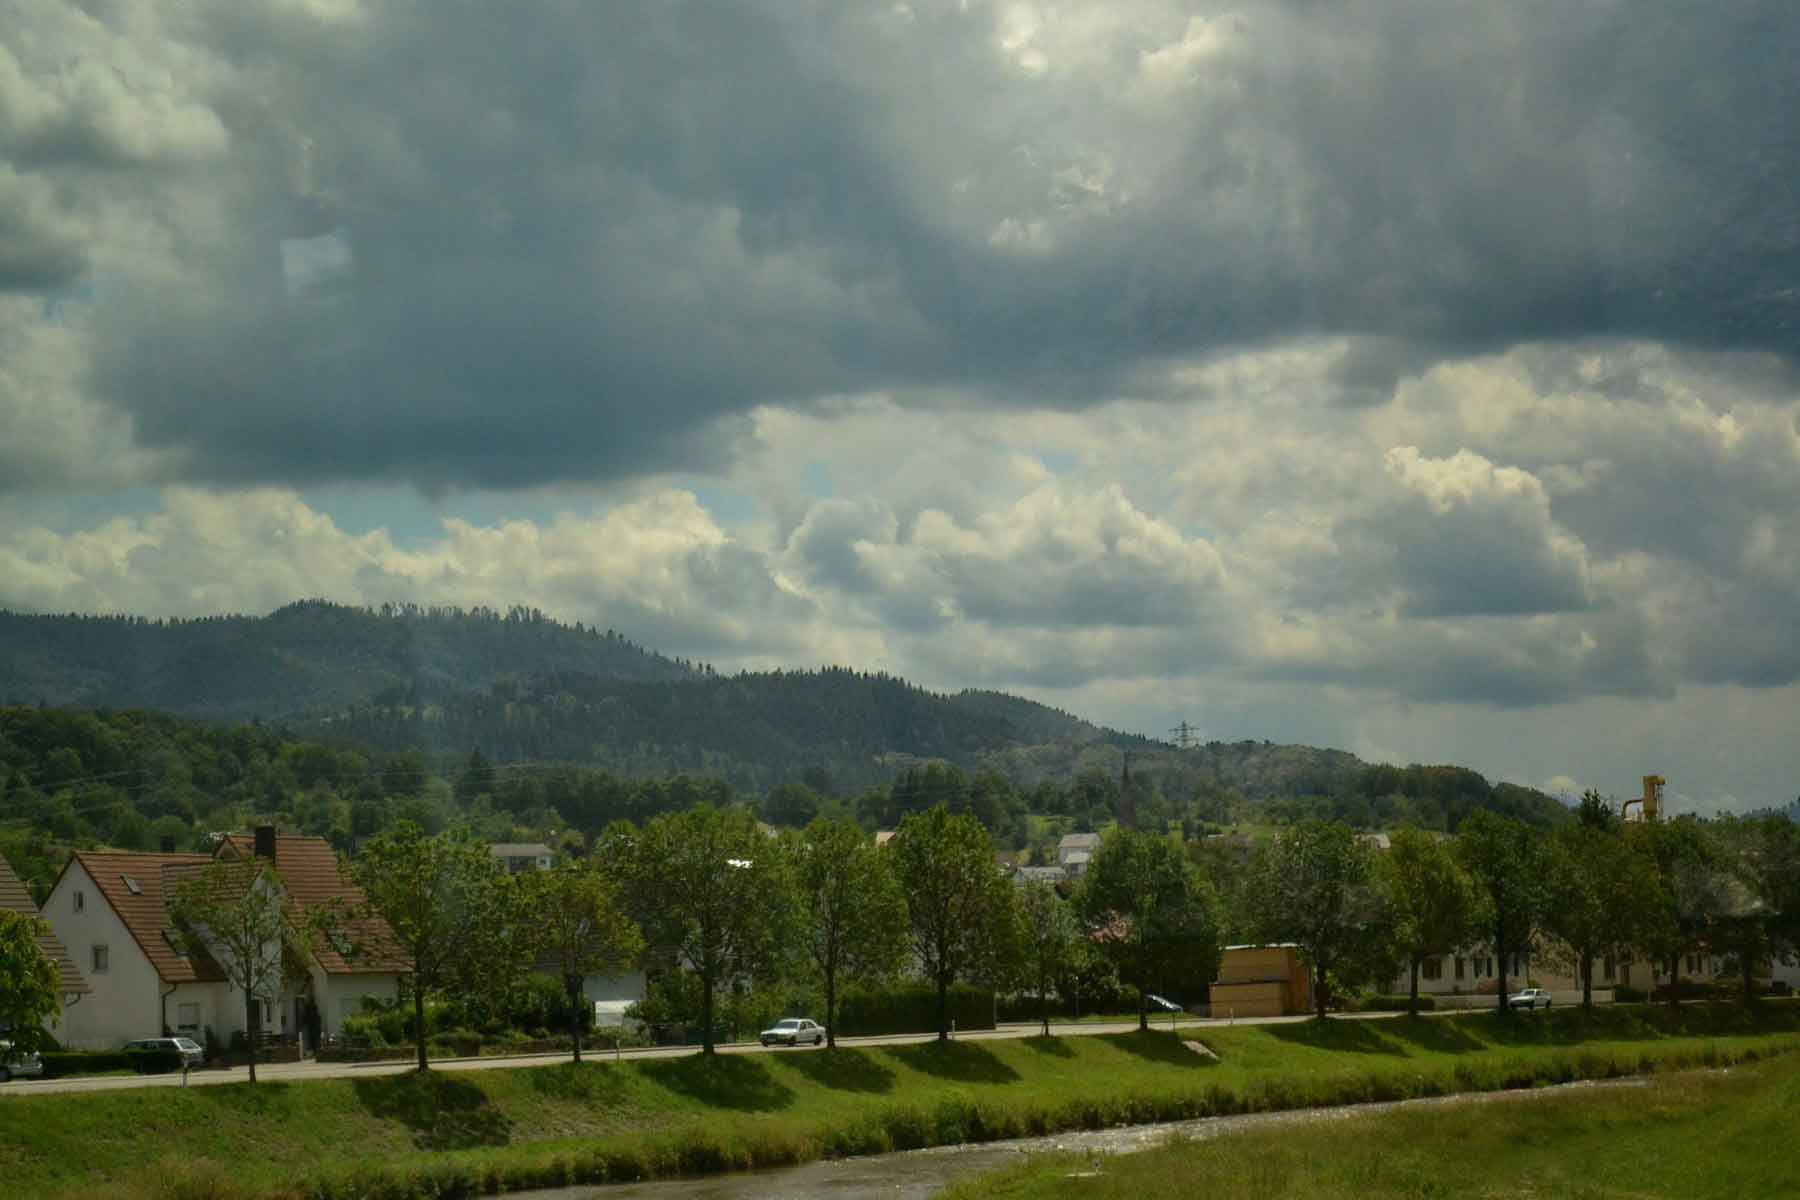 A quaint village in Black Forest, Germany by train. Image©gunjanvirk